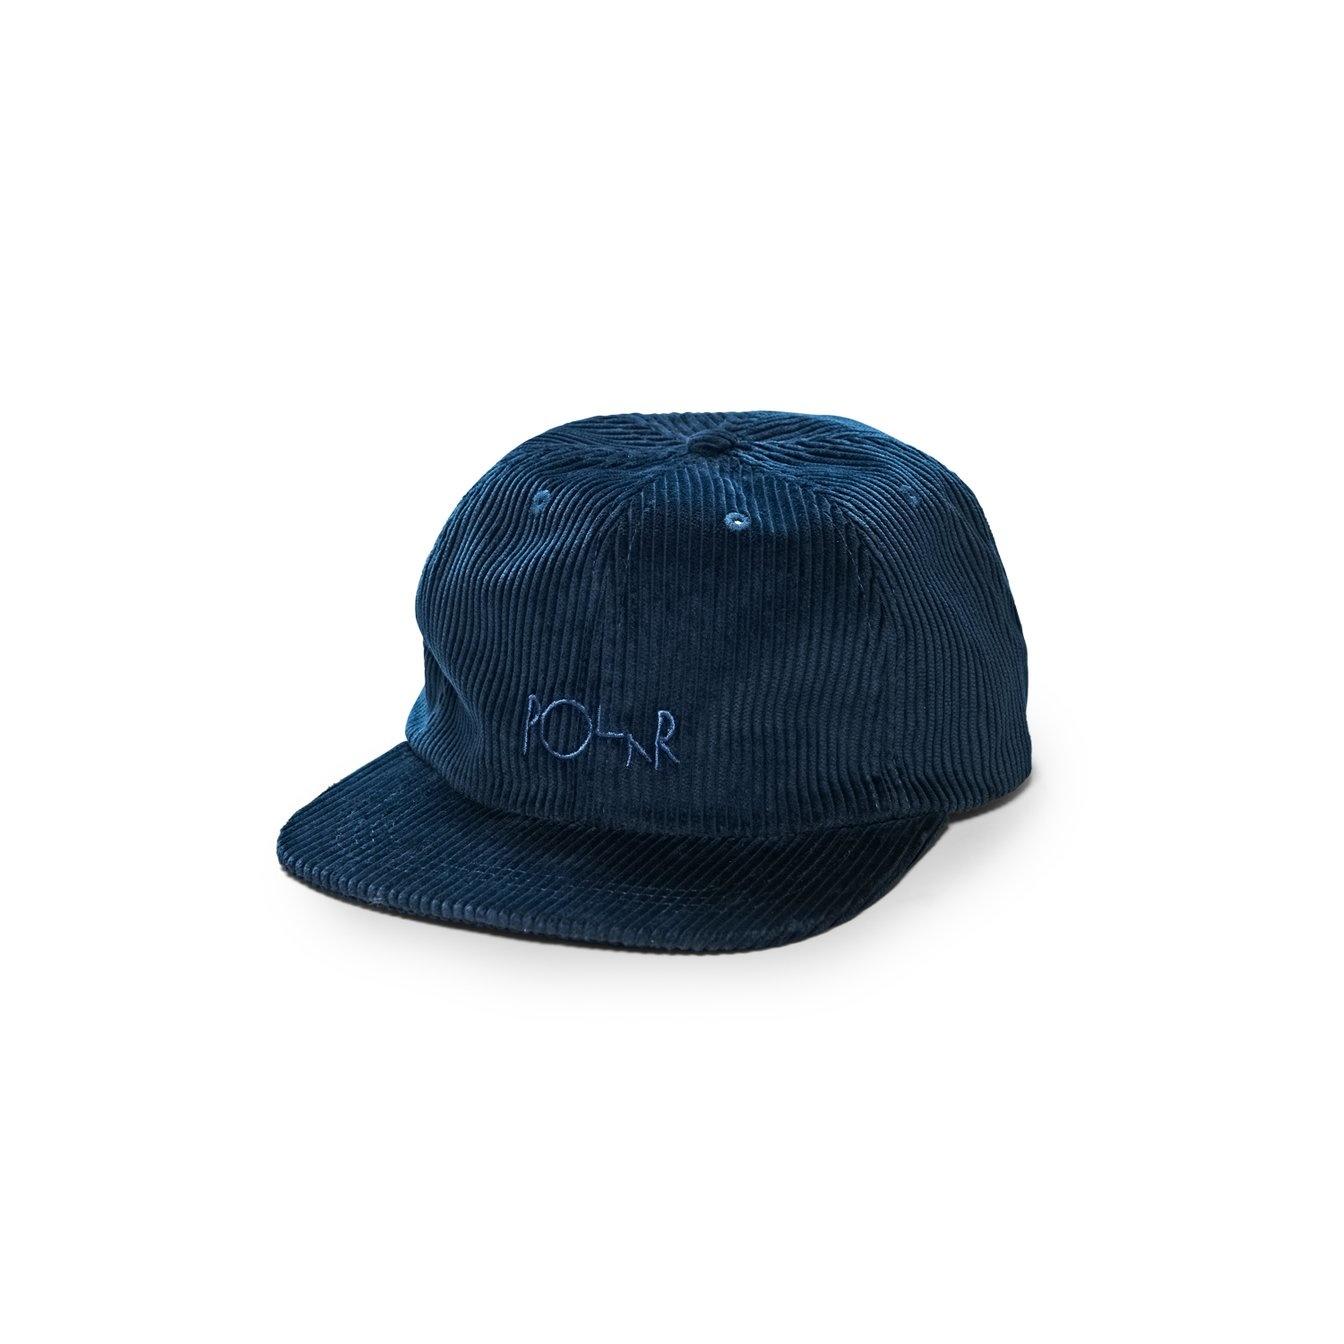 Polar Skate Co. Corduroy Cap Police Blue